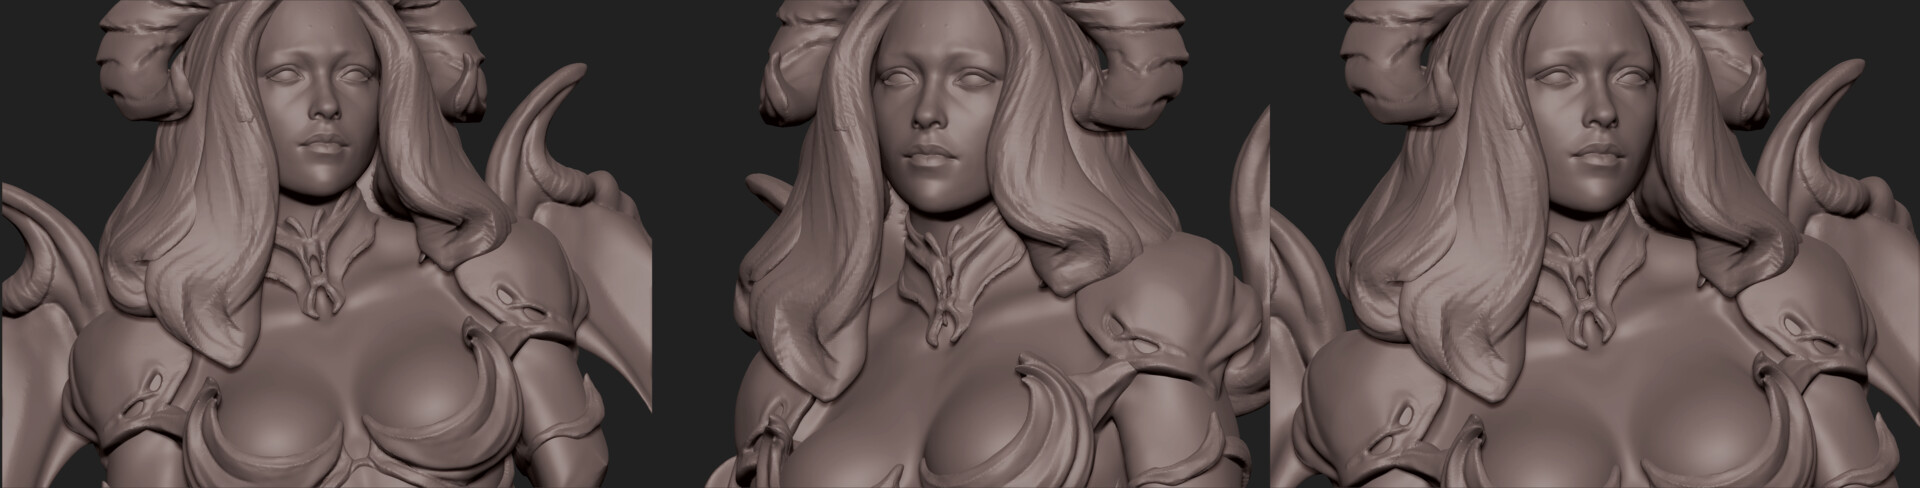 Daniel s rodrigues demon lady sculpt 02